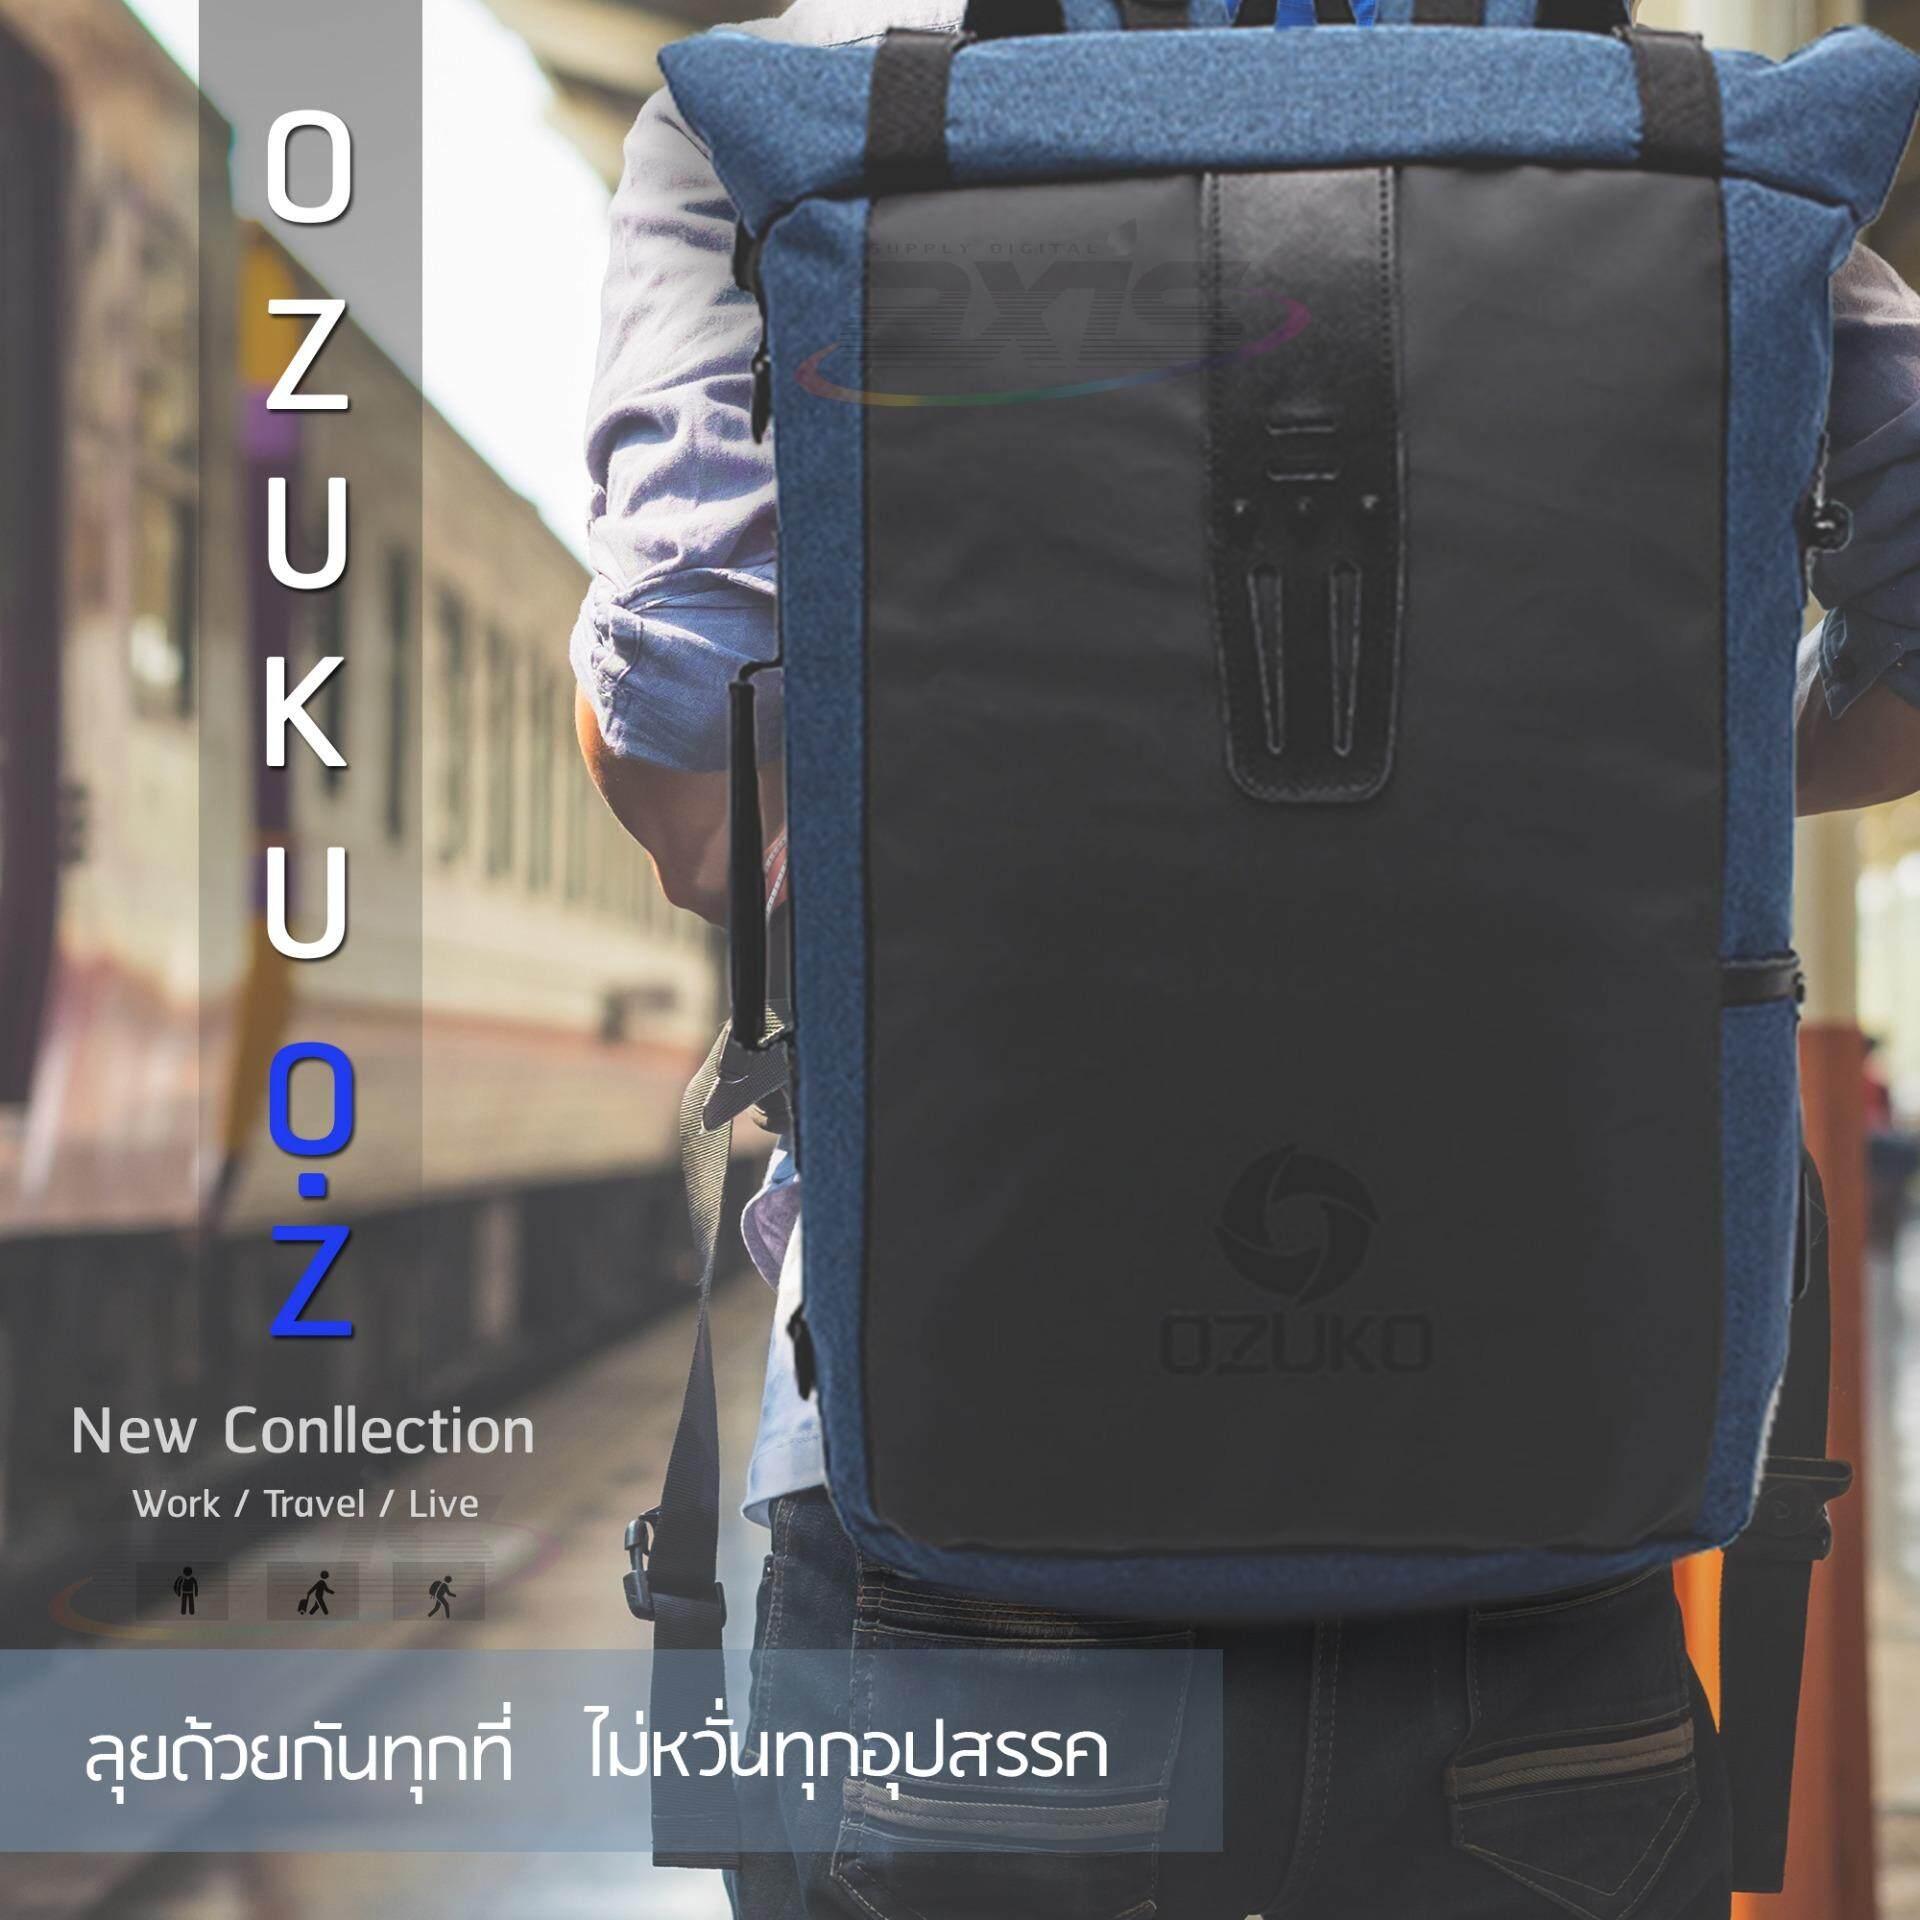 Ozuko Backpack รุ่น Oz Survivor กระเป๋าเป้แฟชั่น กระเป๋าโน๊ตบุ๊ค เป้สะพายหลัง ใส่ของได้เยอะ สีน้ำเงิน เป็นต้นฉบับ